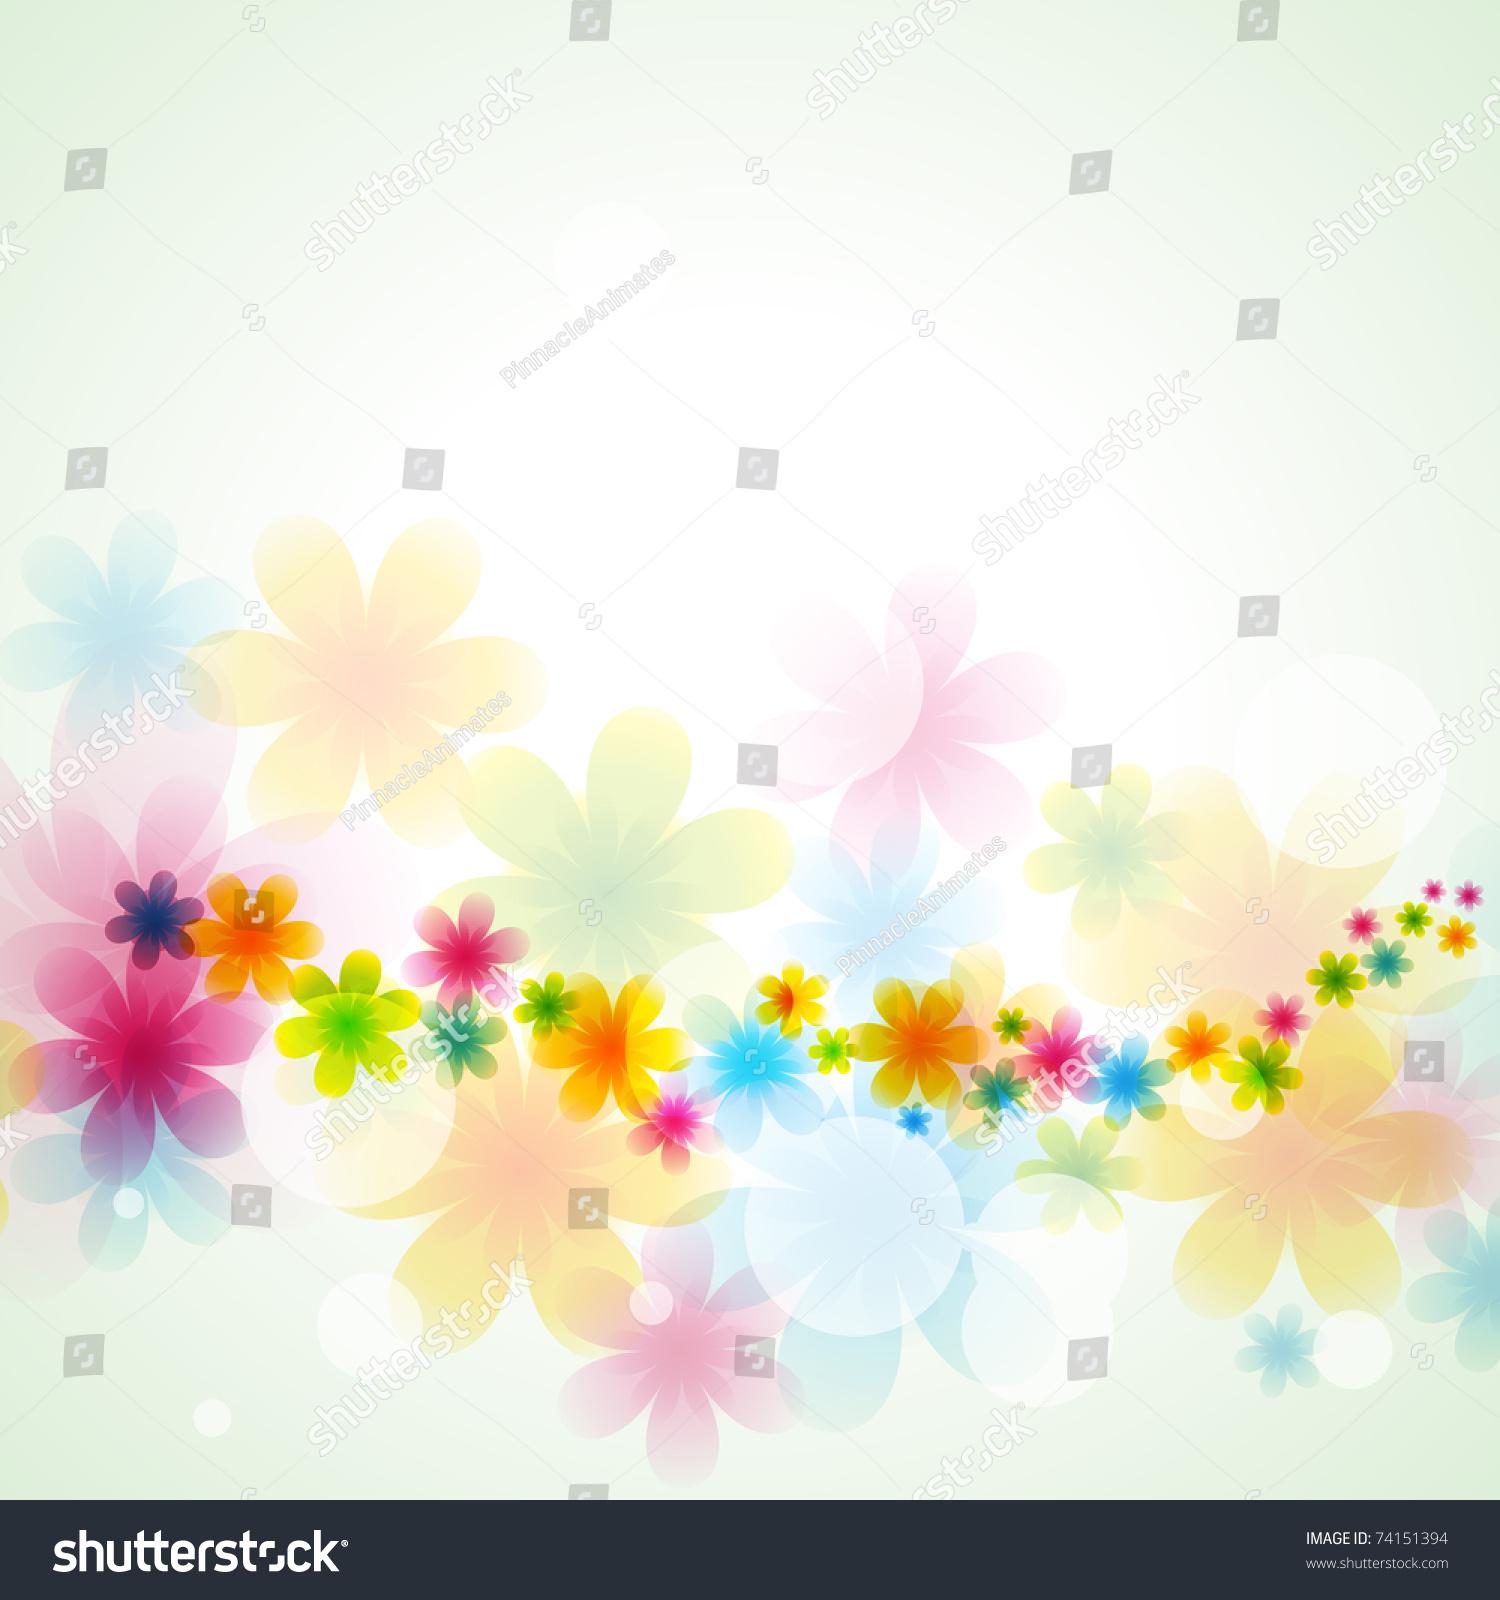 Beautiful Flower Vector Background Illustration - 74151394 ...